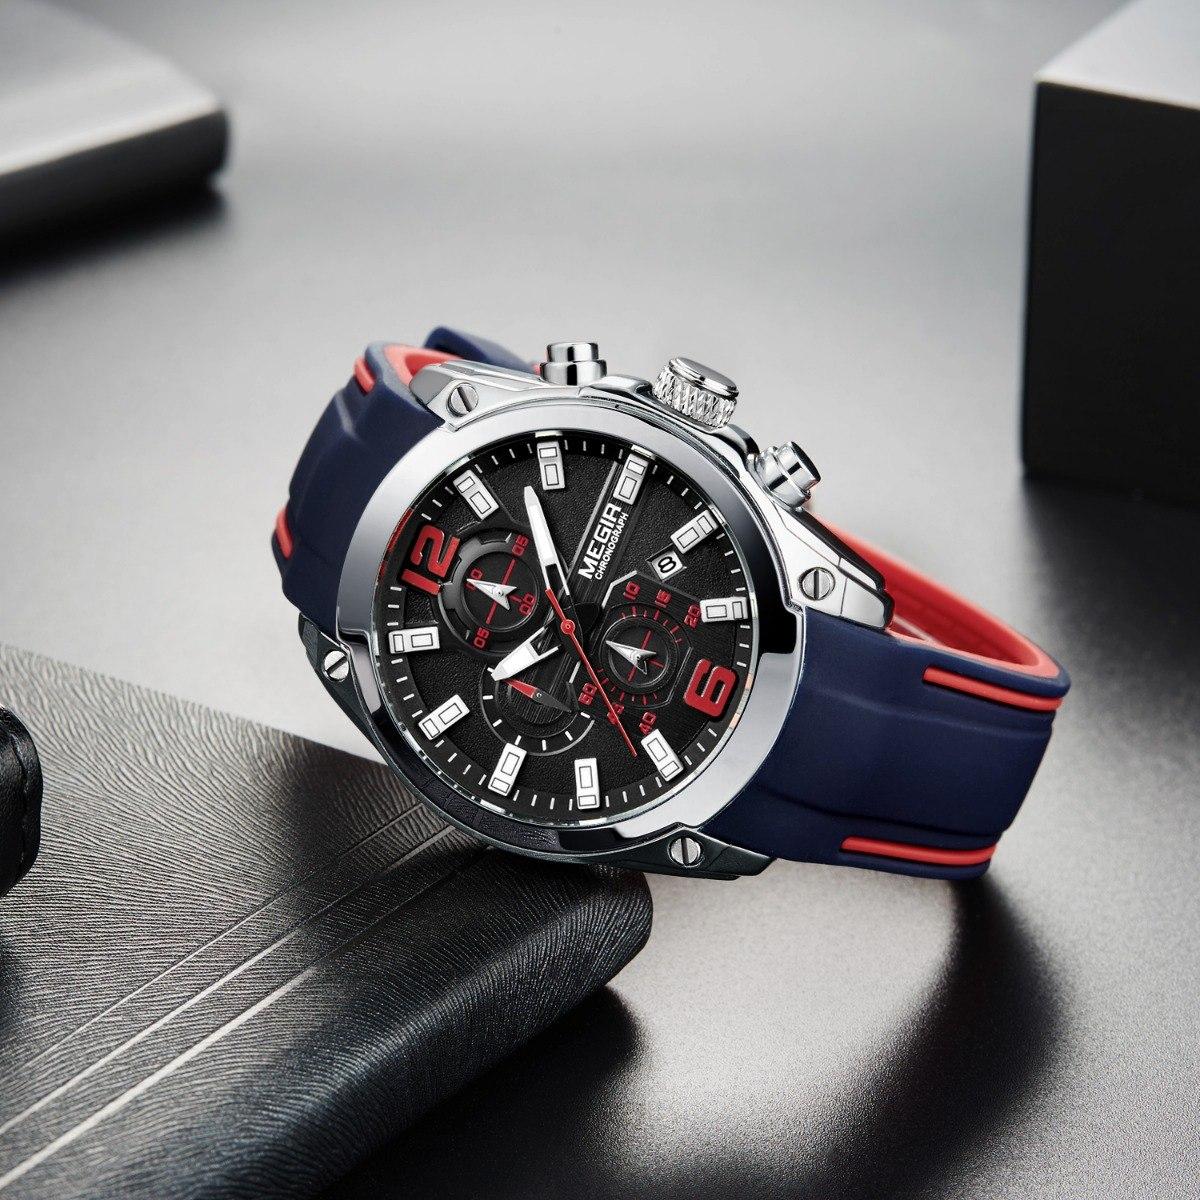 0a3ea153ef28 Reloj Cronógrafo Original Megir 2018 Deportivo Análogo -   890.00 en ...